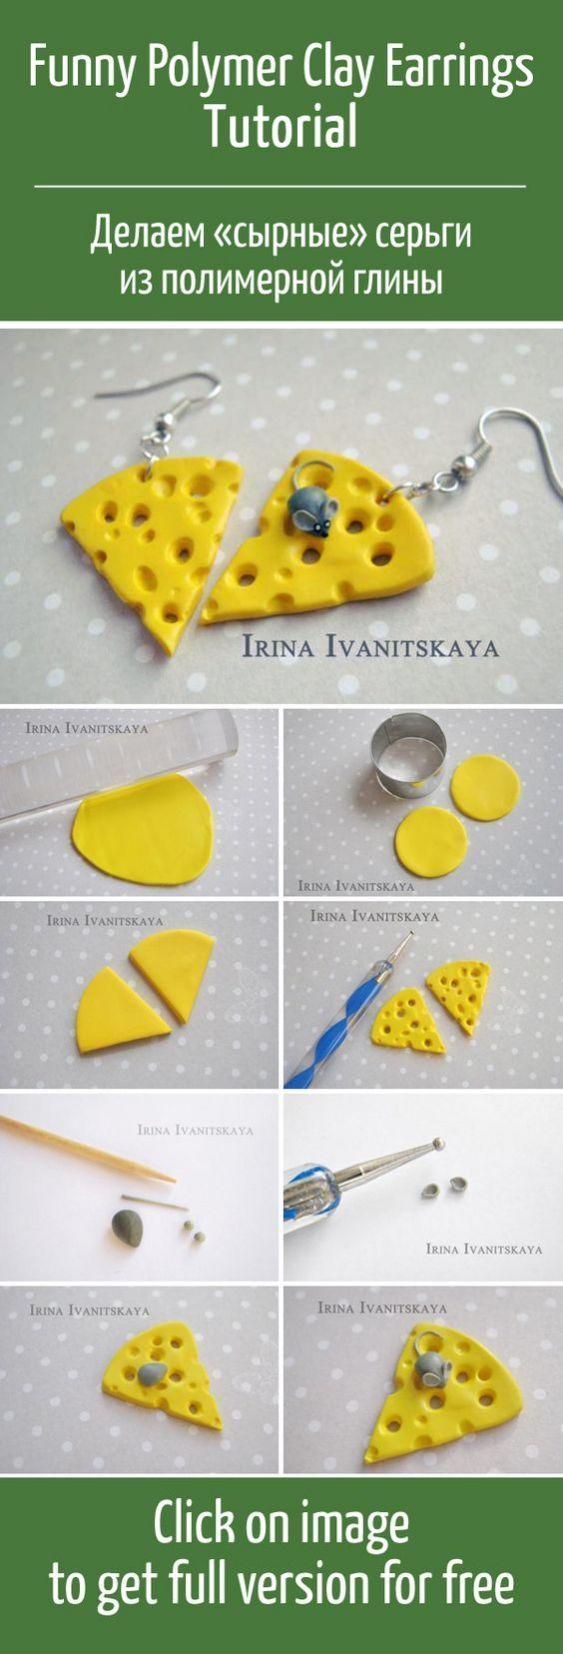 МК серёжки кусочки сыра